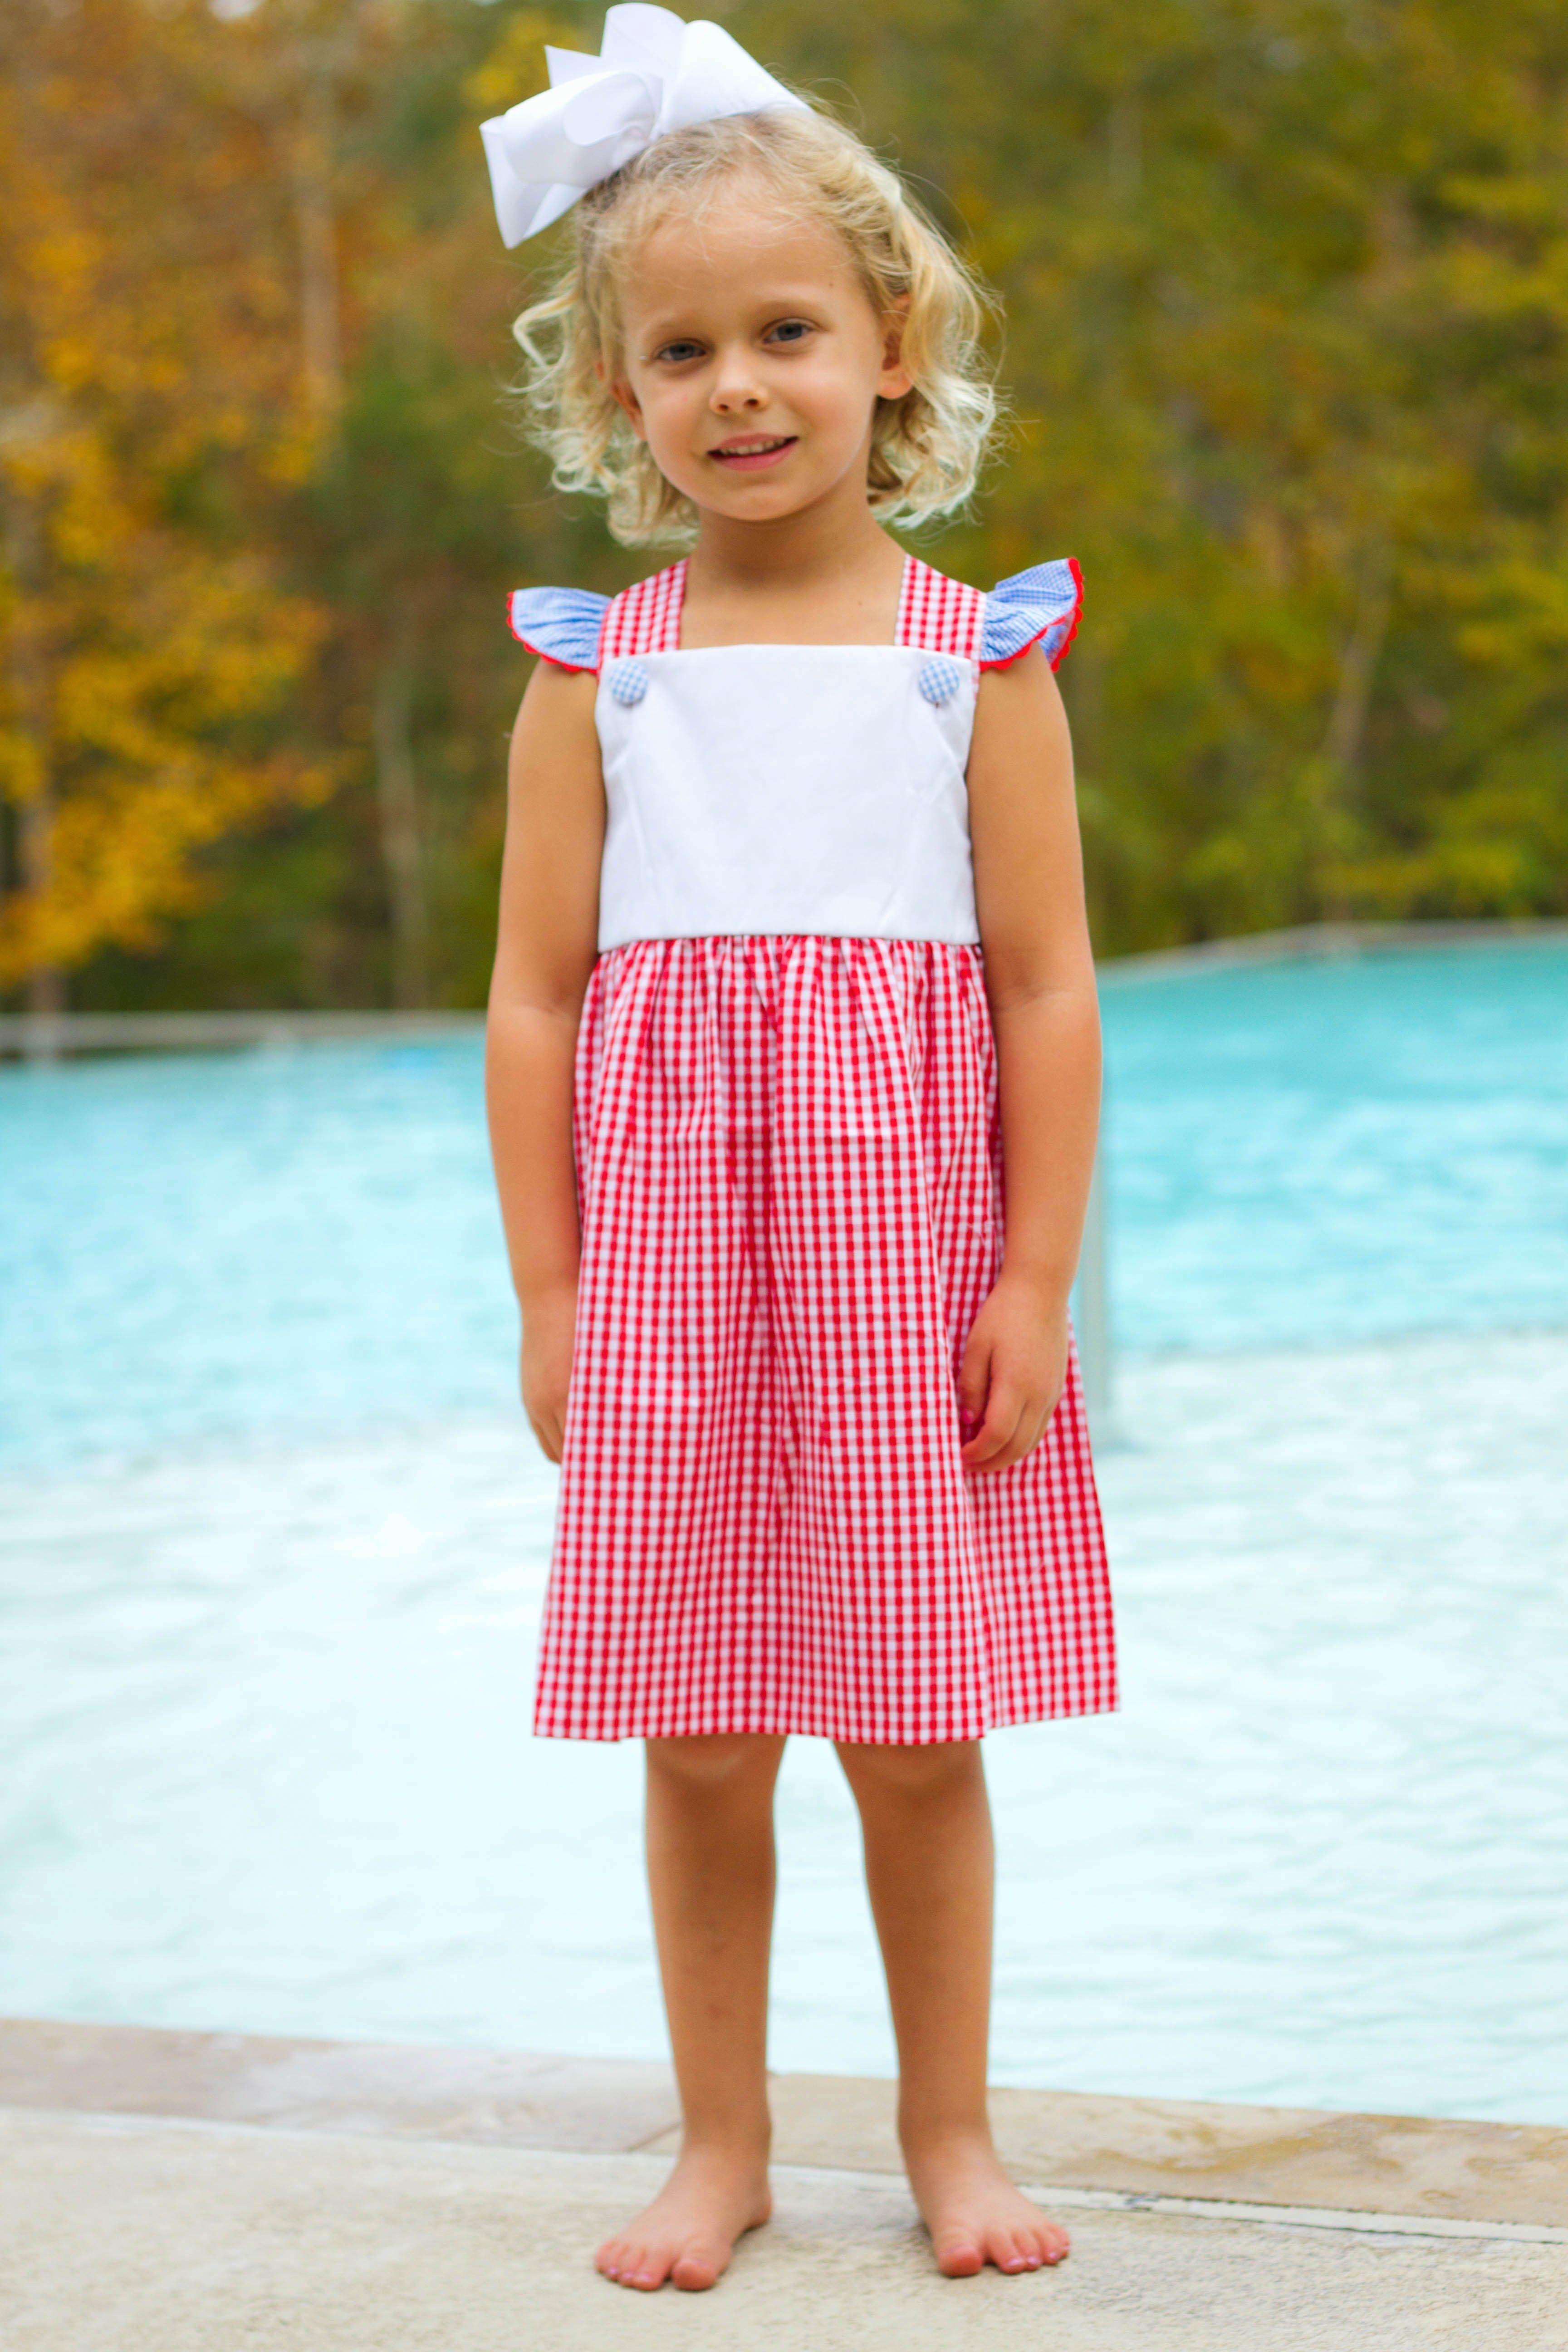 aa7e9d1d7a RWB PREORDER 6: Red White and Blue Gingham Ric Rac Dress Monogrammed  Purses, Blue